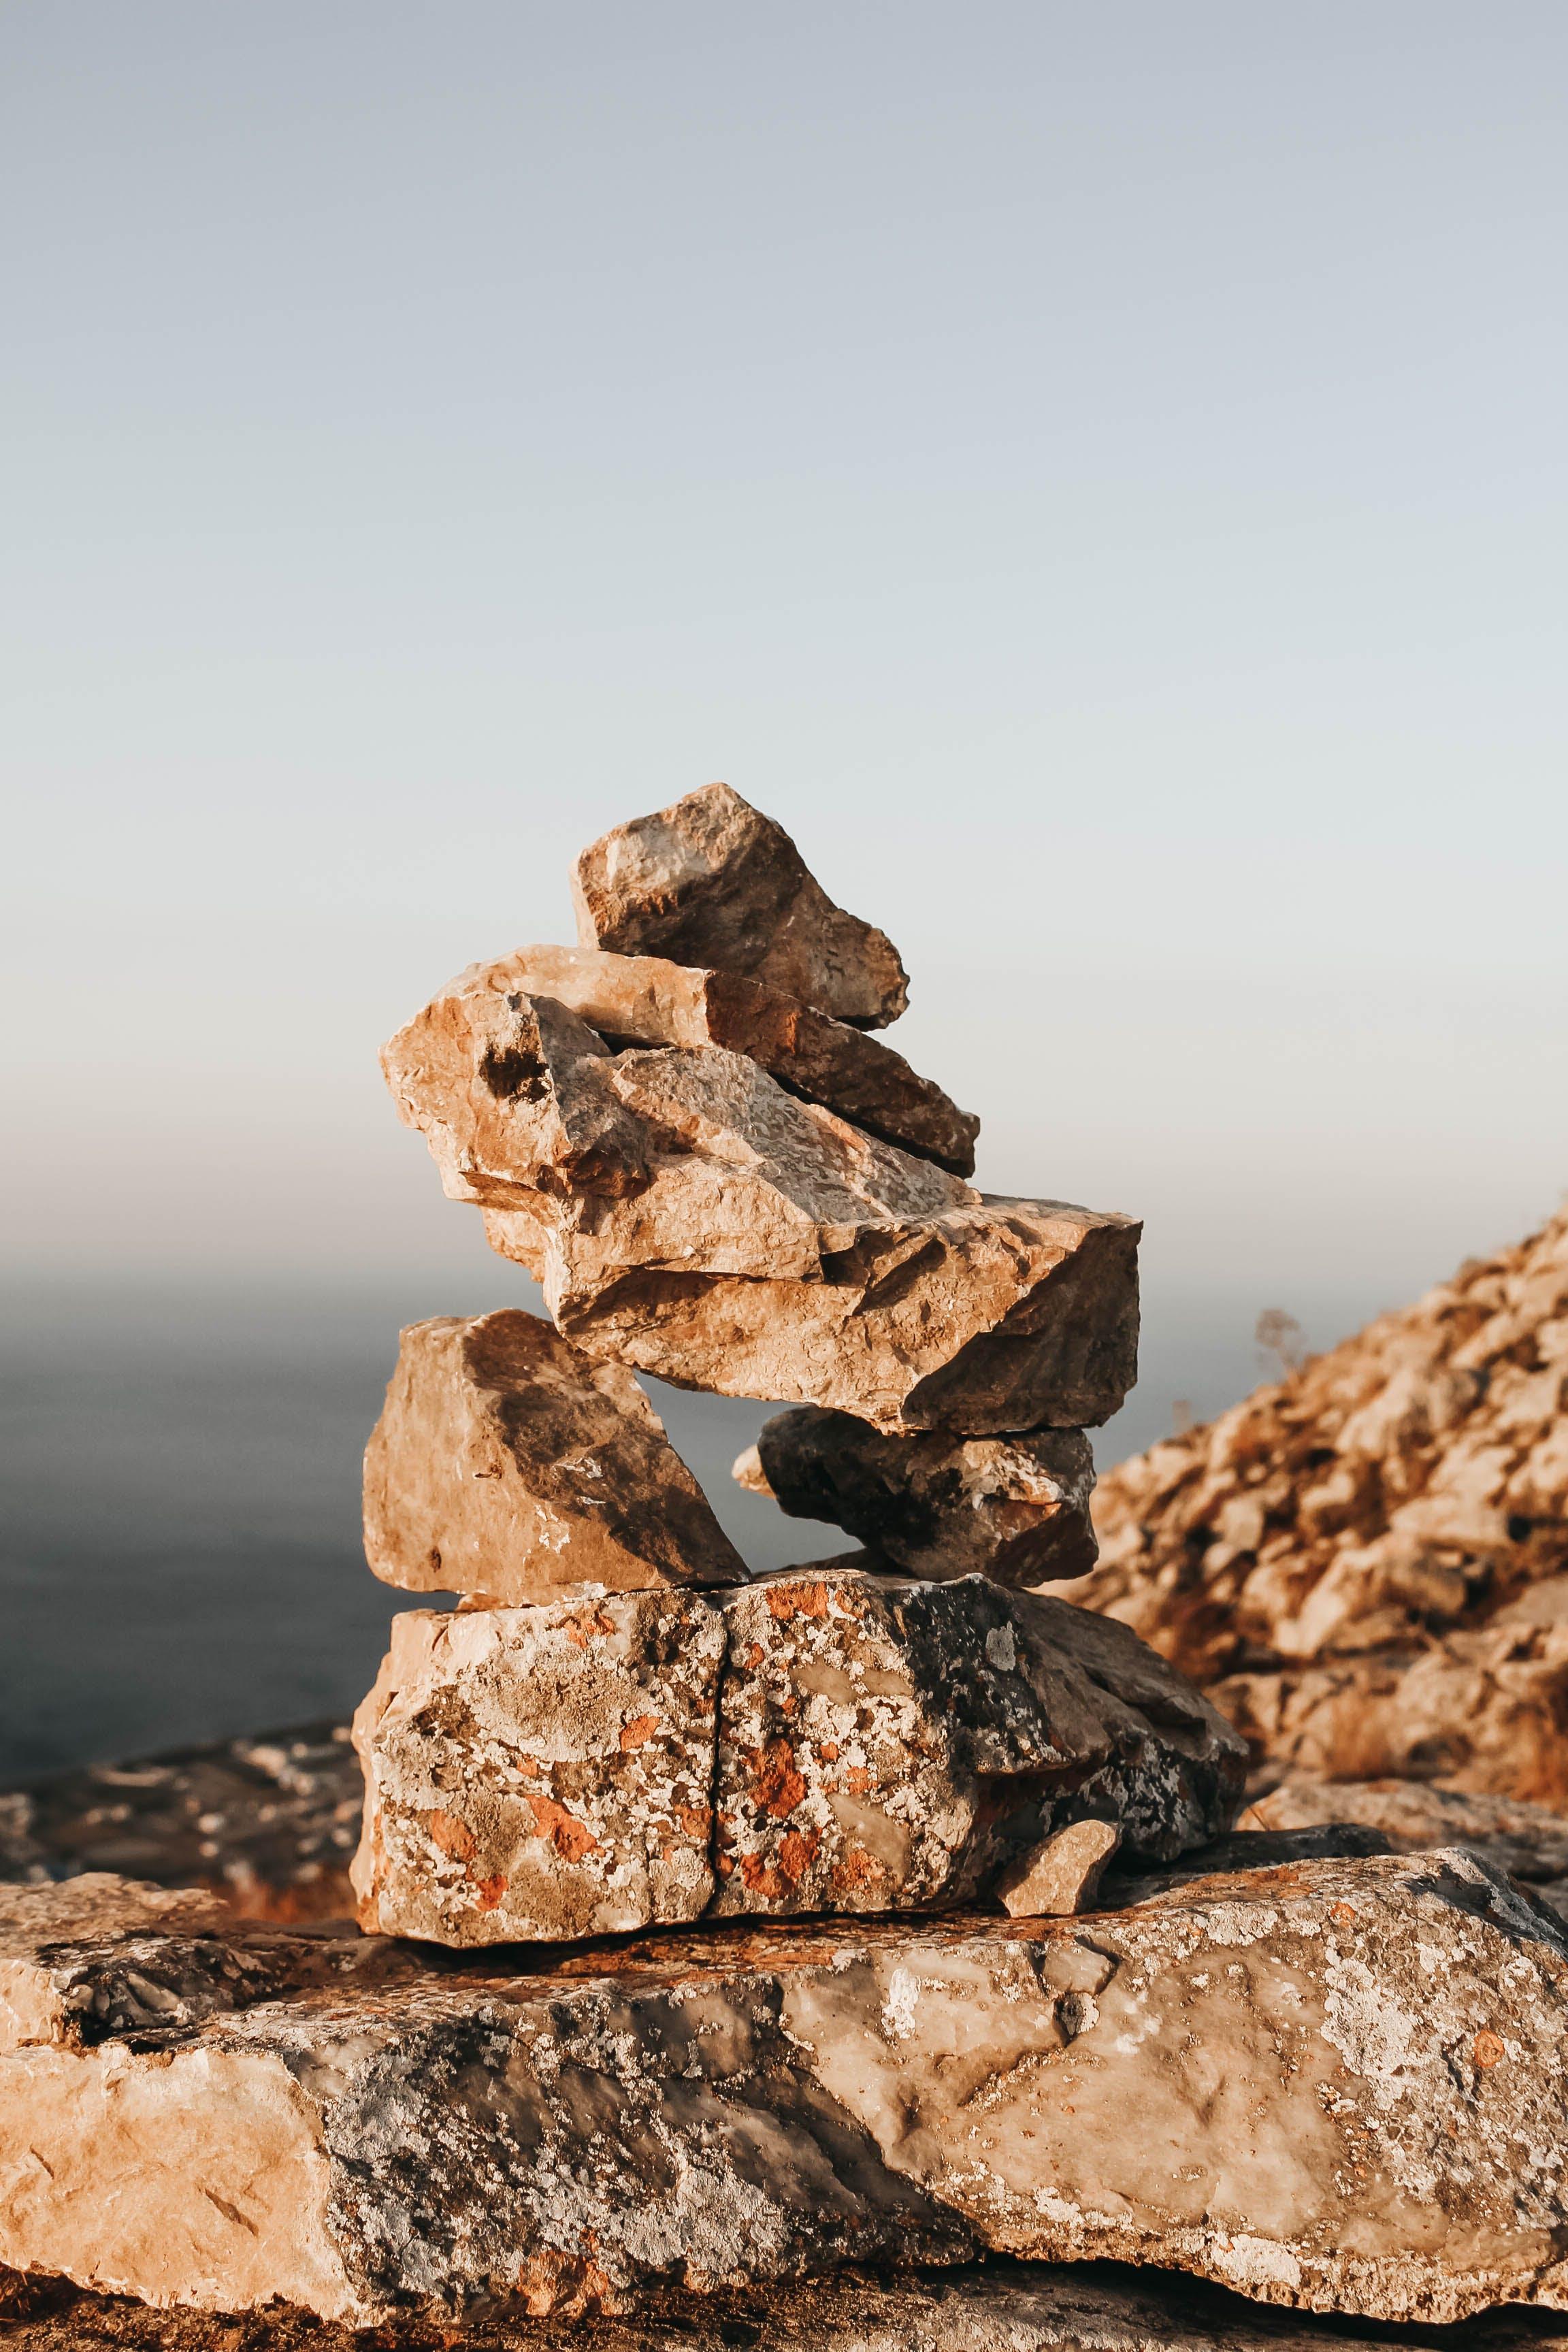 Základová fotografie zdarma na téma geologie, hnědá, kameny, rovnováha